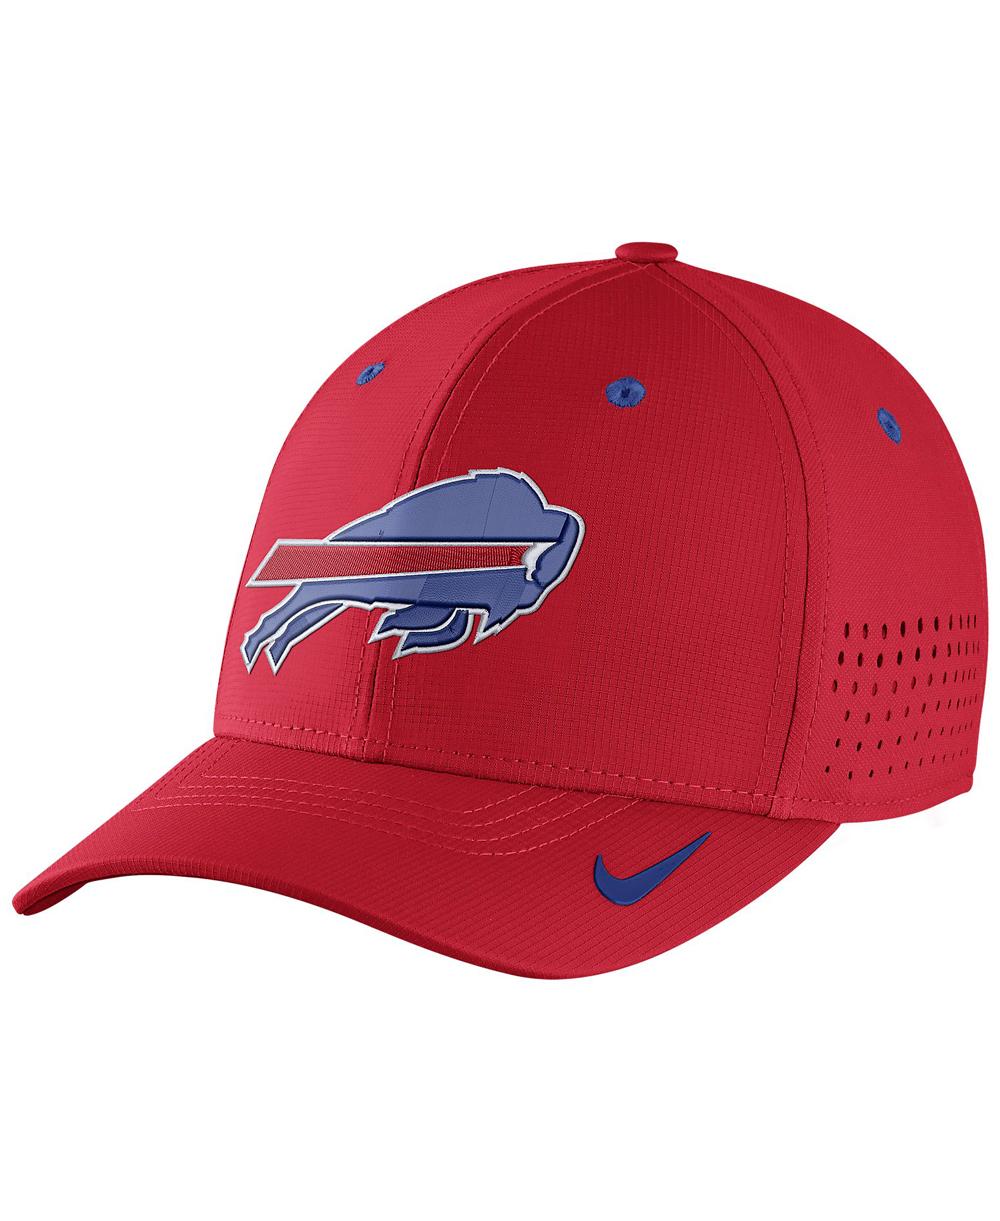 Legacy Vapor Swoosh Flex Cappellino Uomo NFL Bills